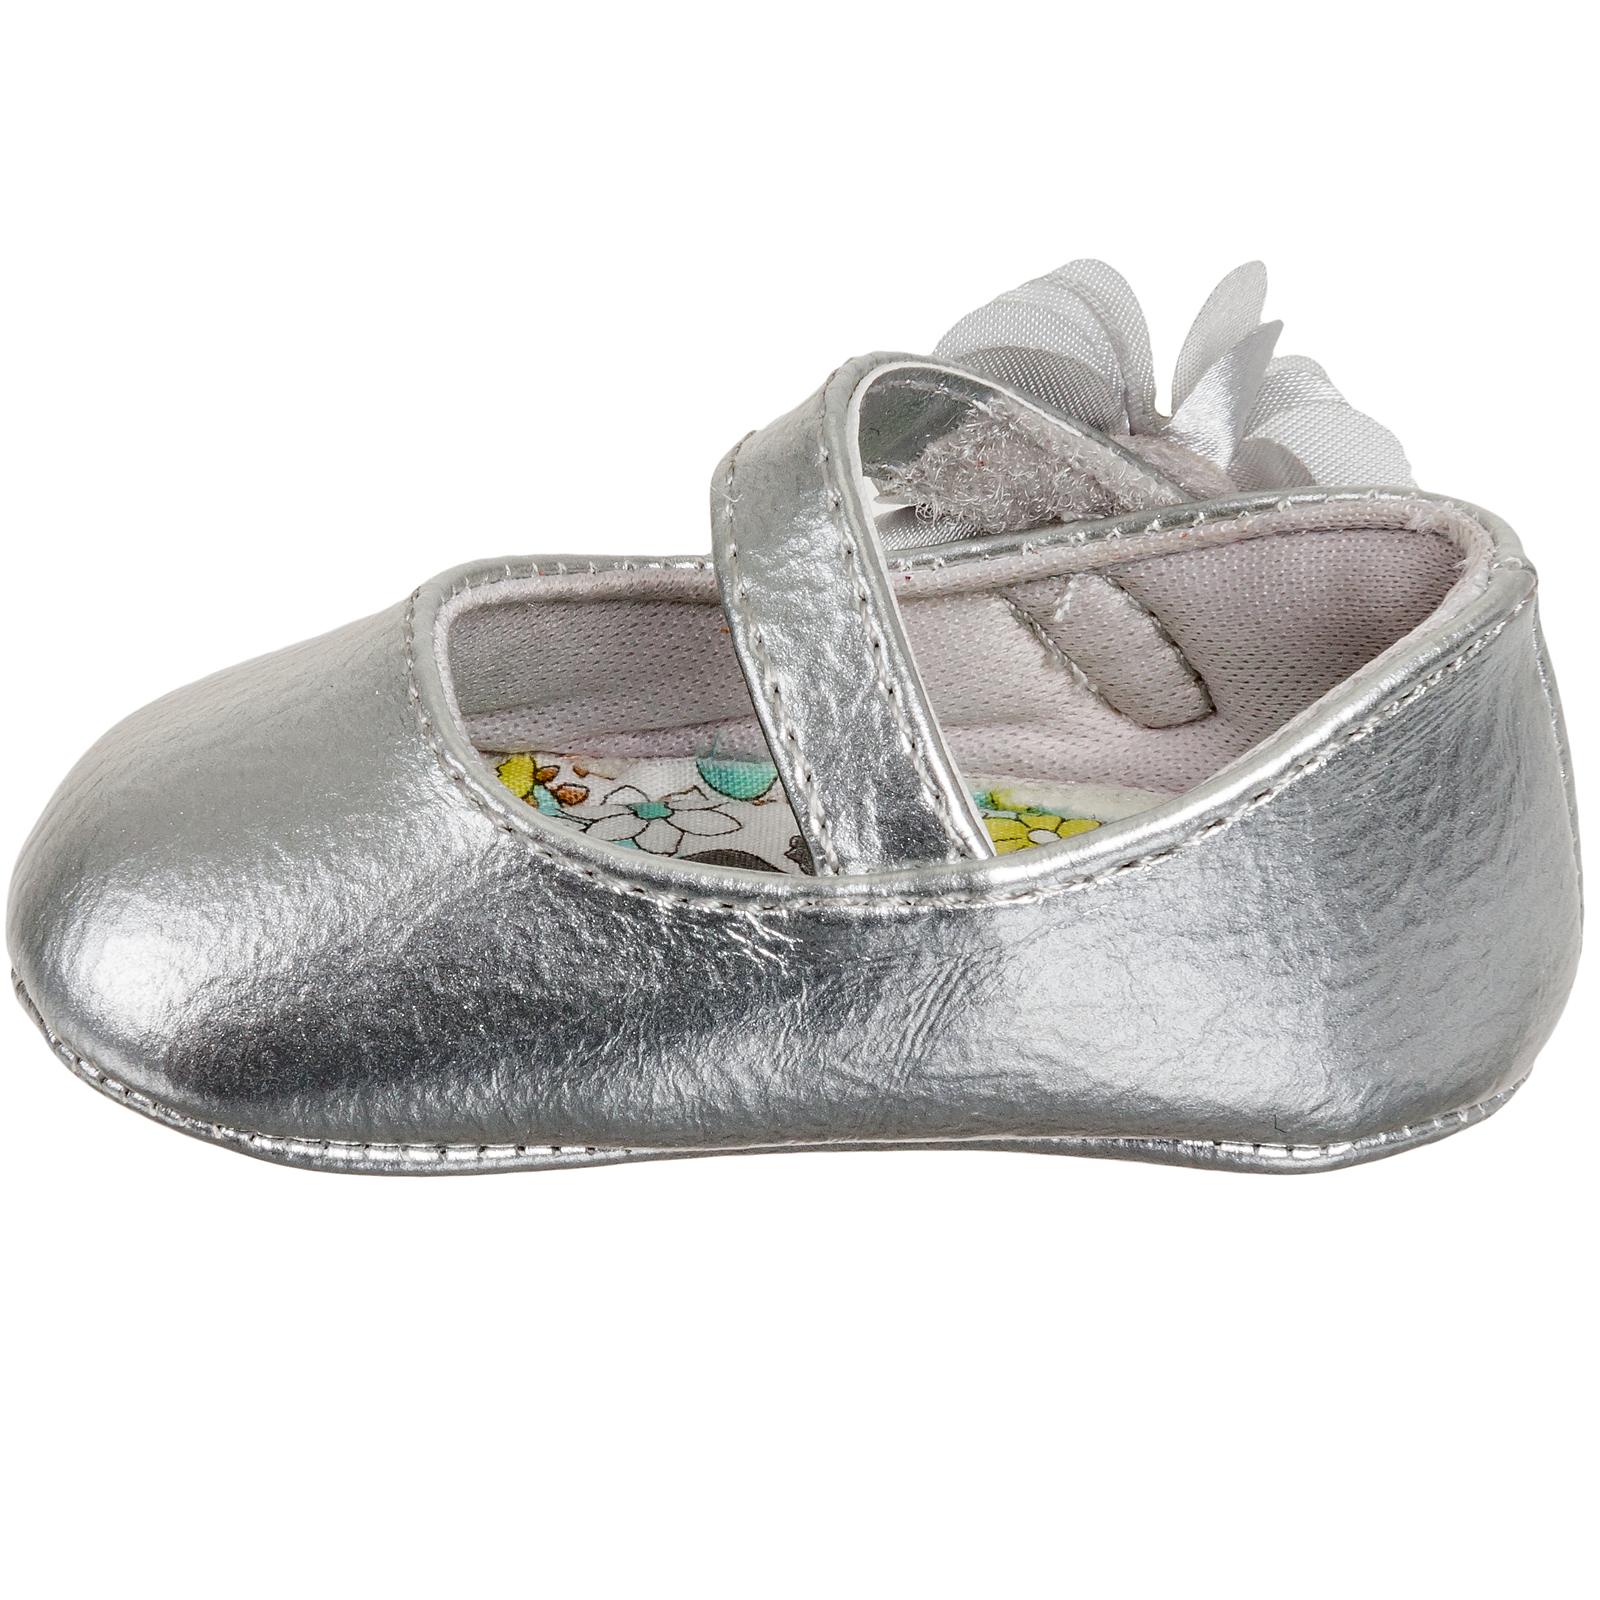 Baby Deer Girls Patent Skimmer Soft Sole Ballet Flat